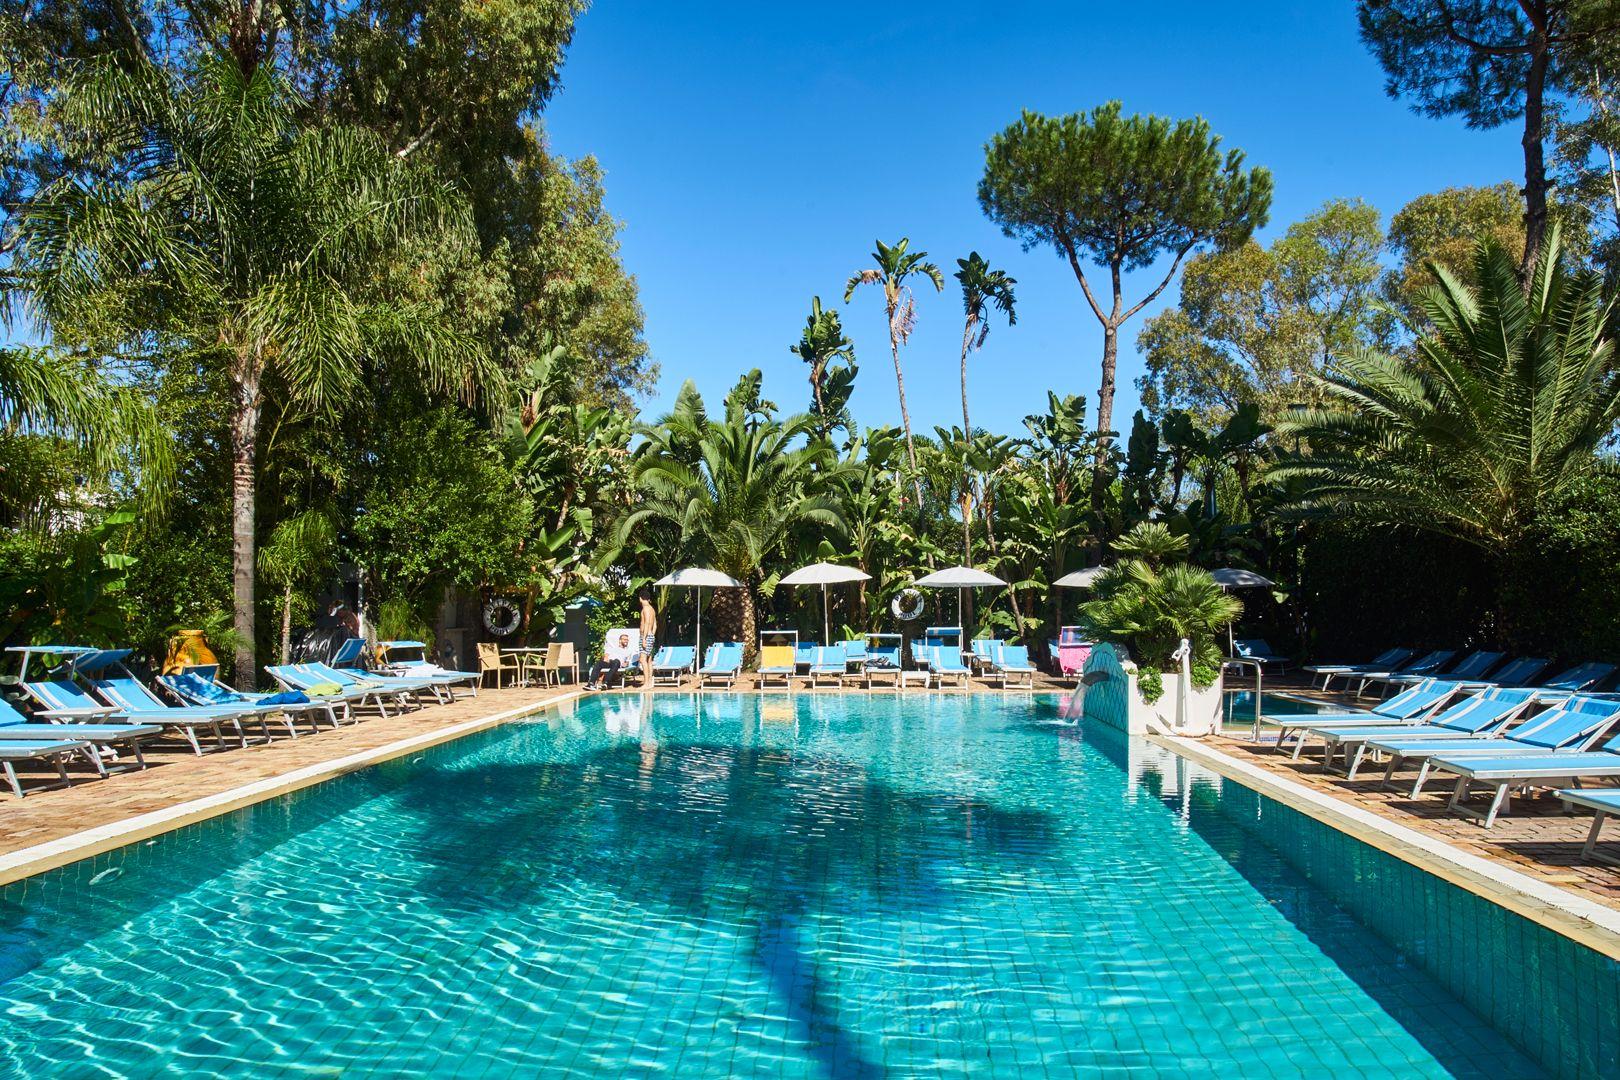 Hotel-central-park-ischia-12